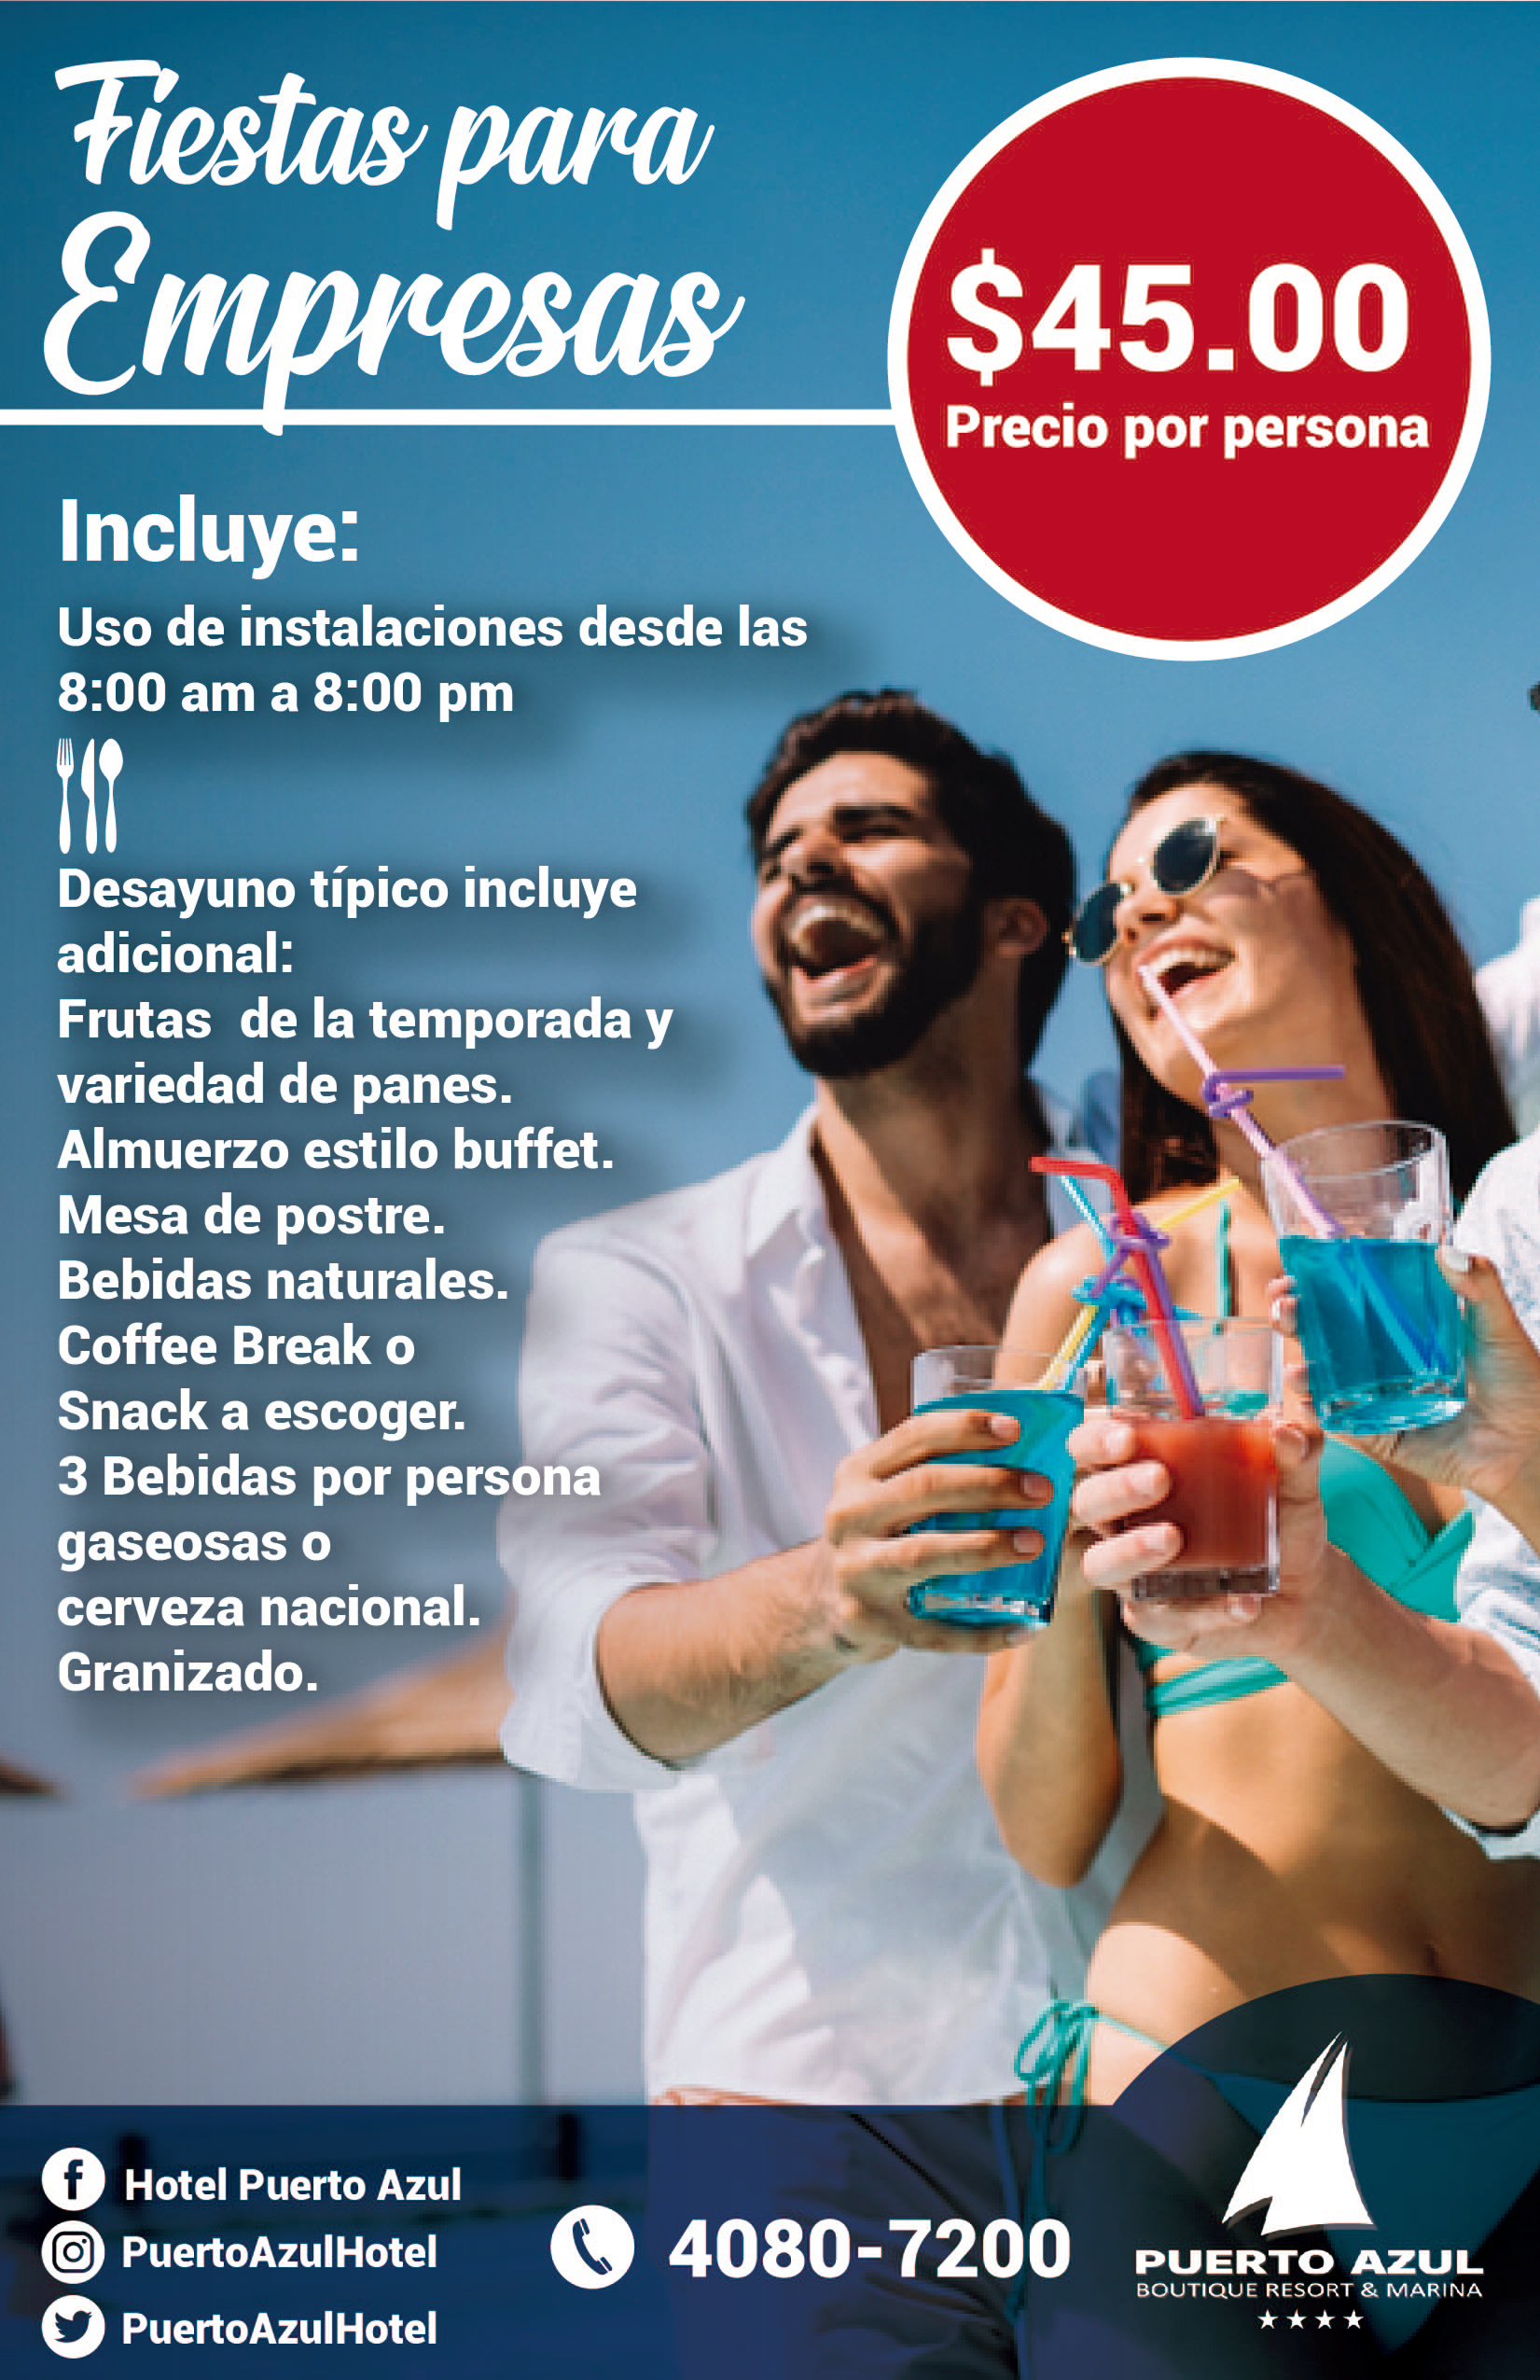 PAQUETES MEDIA CARTA JANINA_Fiestas para